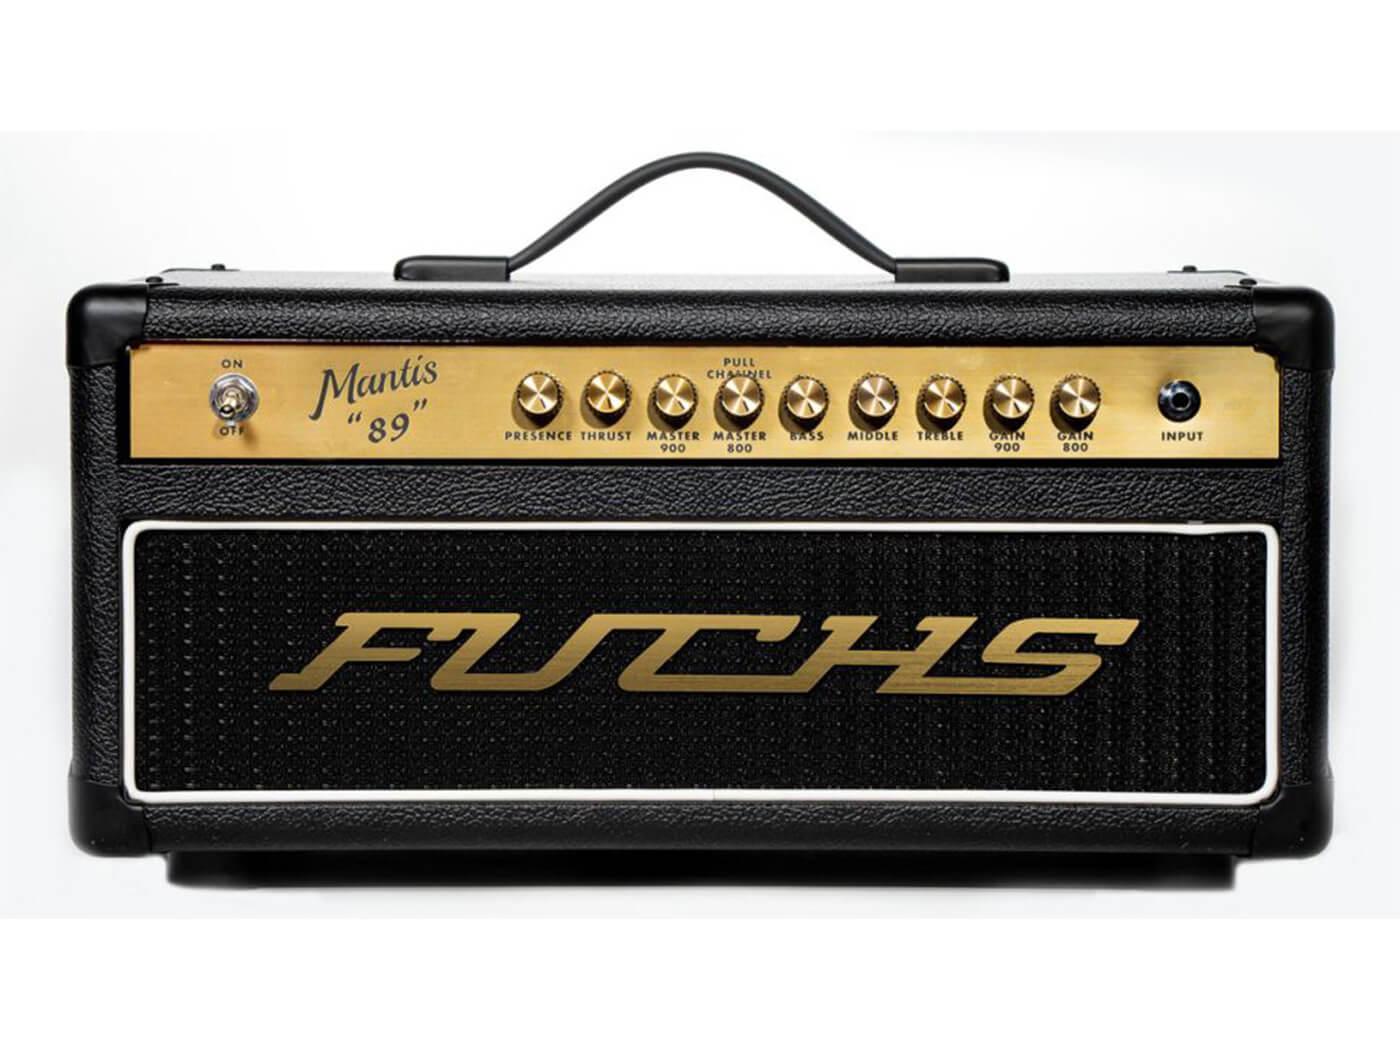 Fuchs Mantis 89